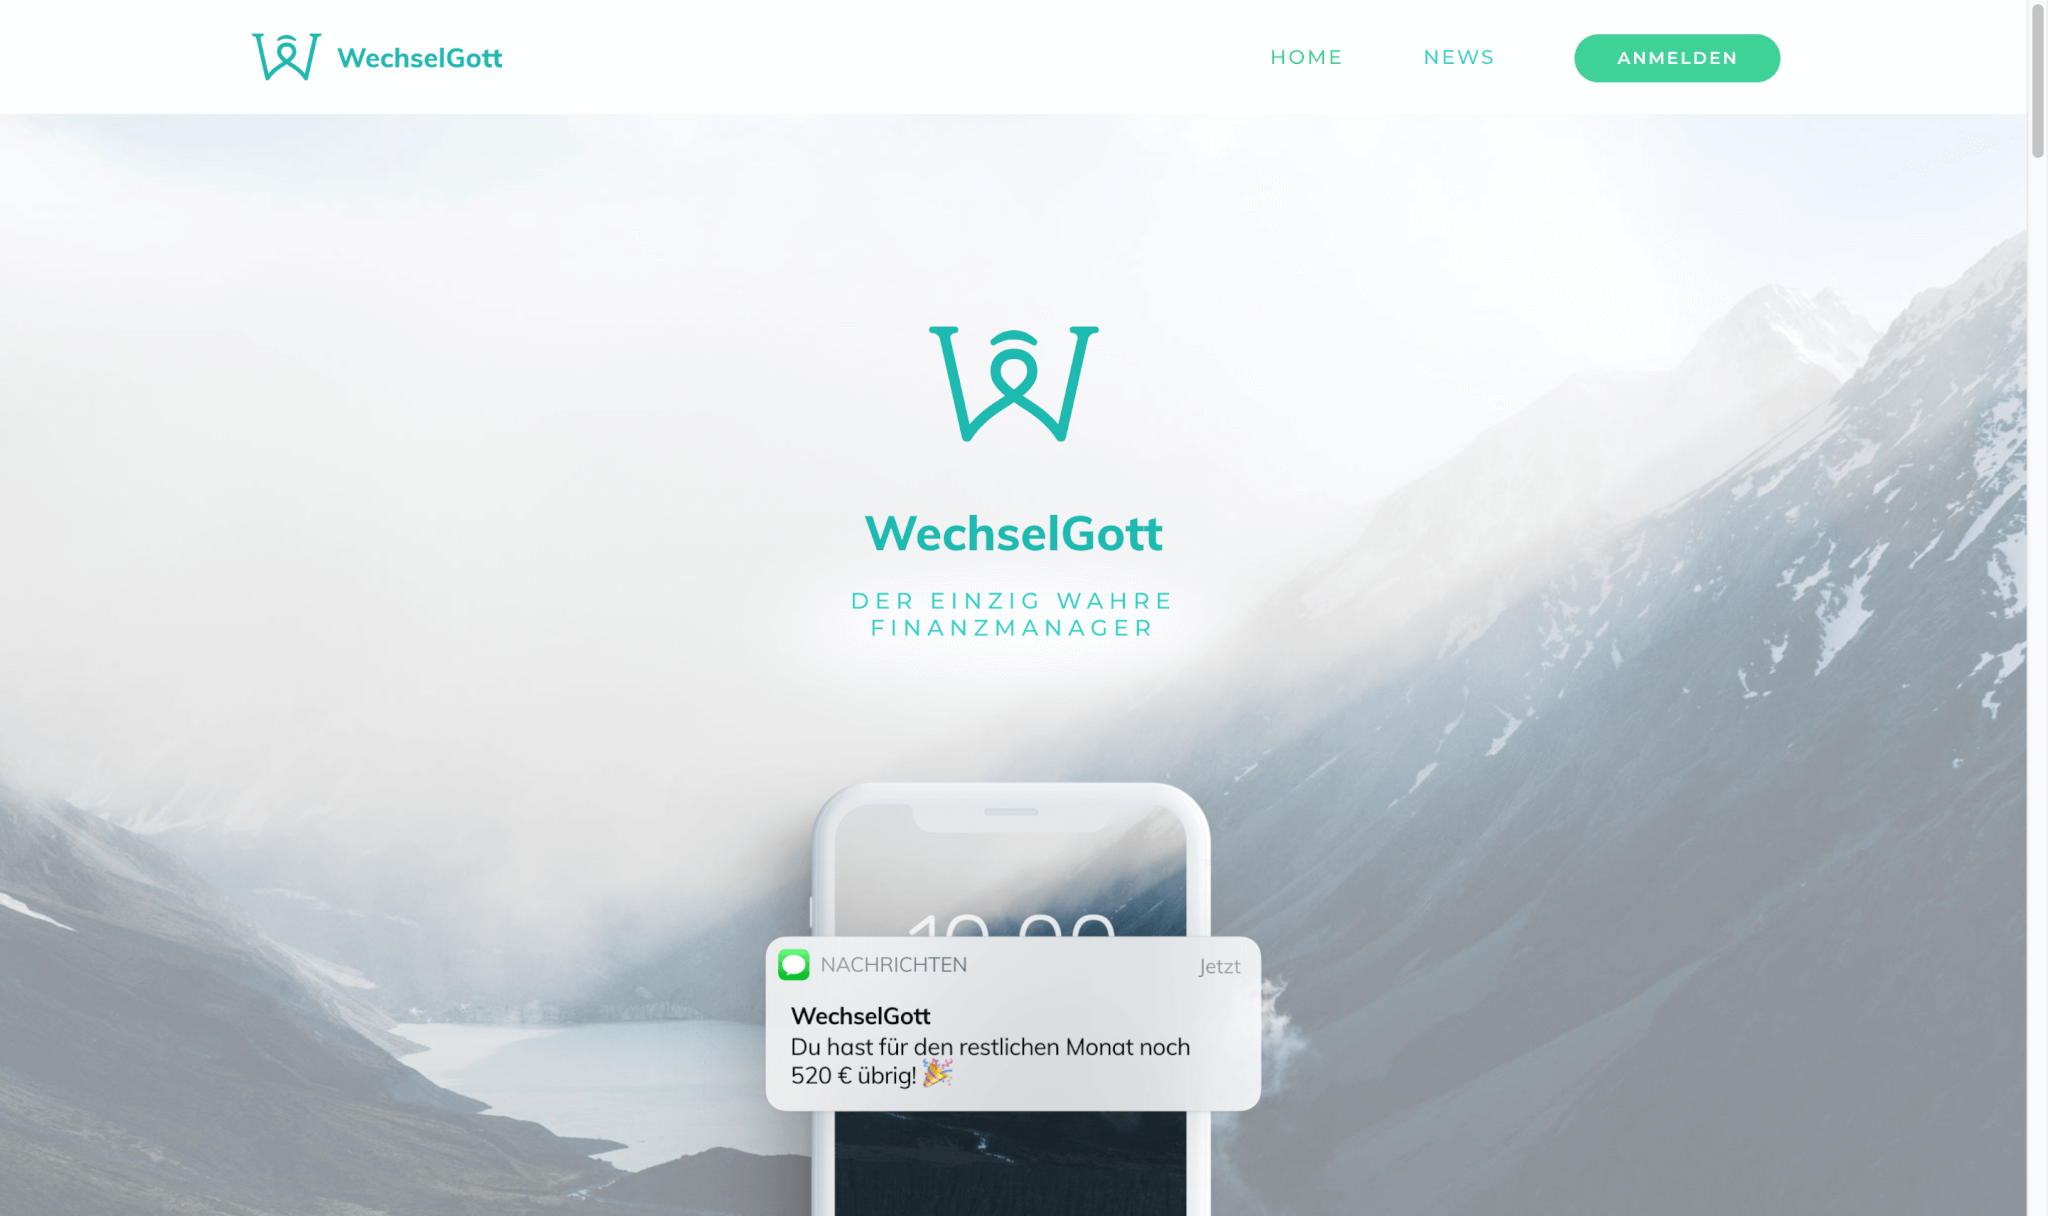 wechselgott.com_